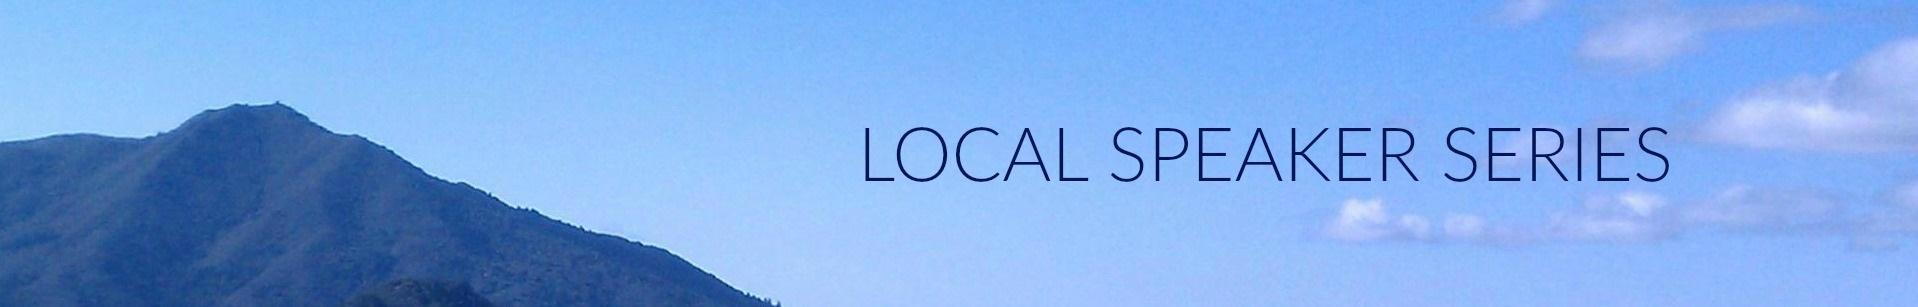 local speaker series